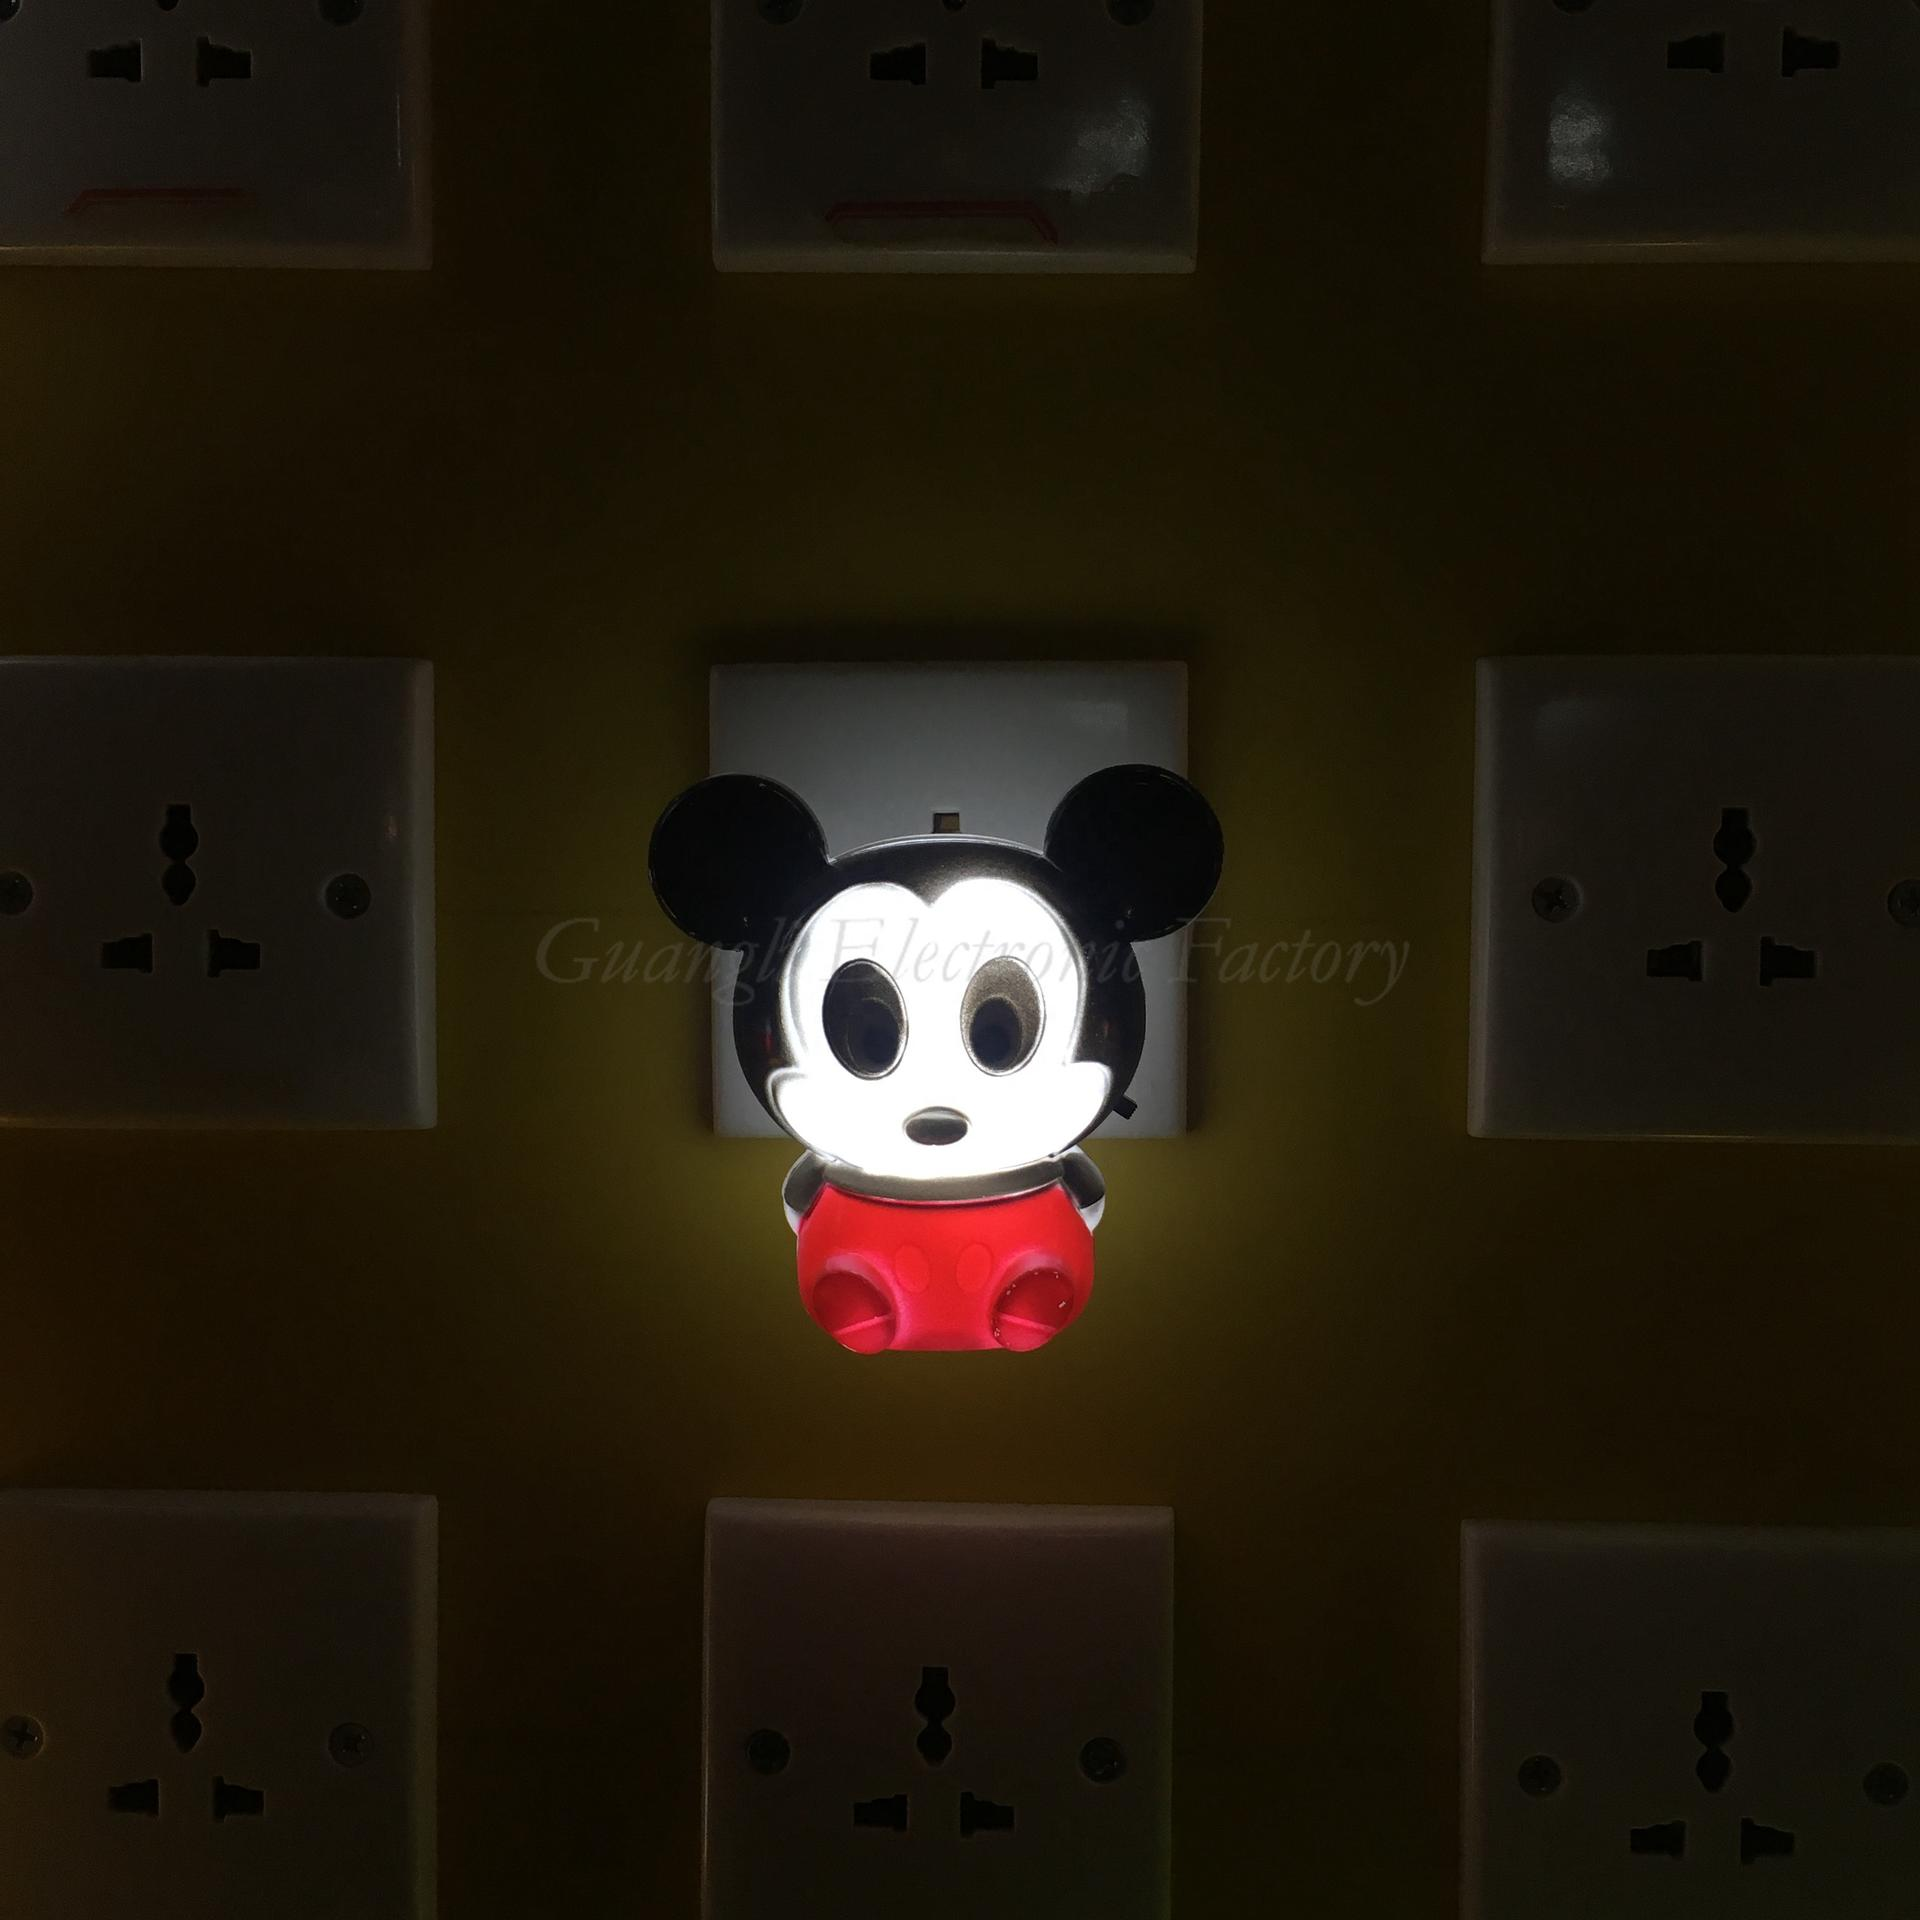 Toy Mickey Mouse shape 4 SMD mini switch plug in night light 0.6W AC 110V 220V W051